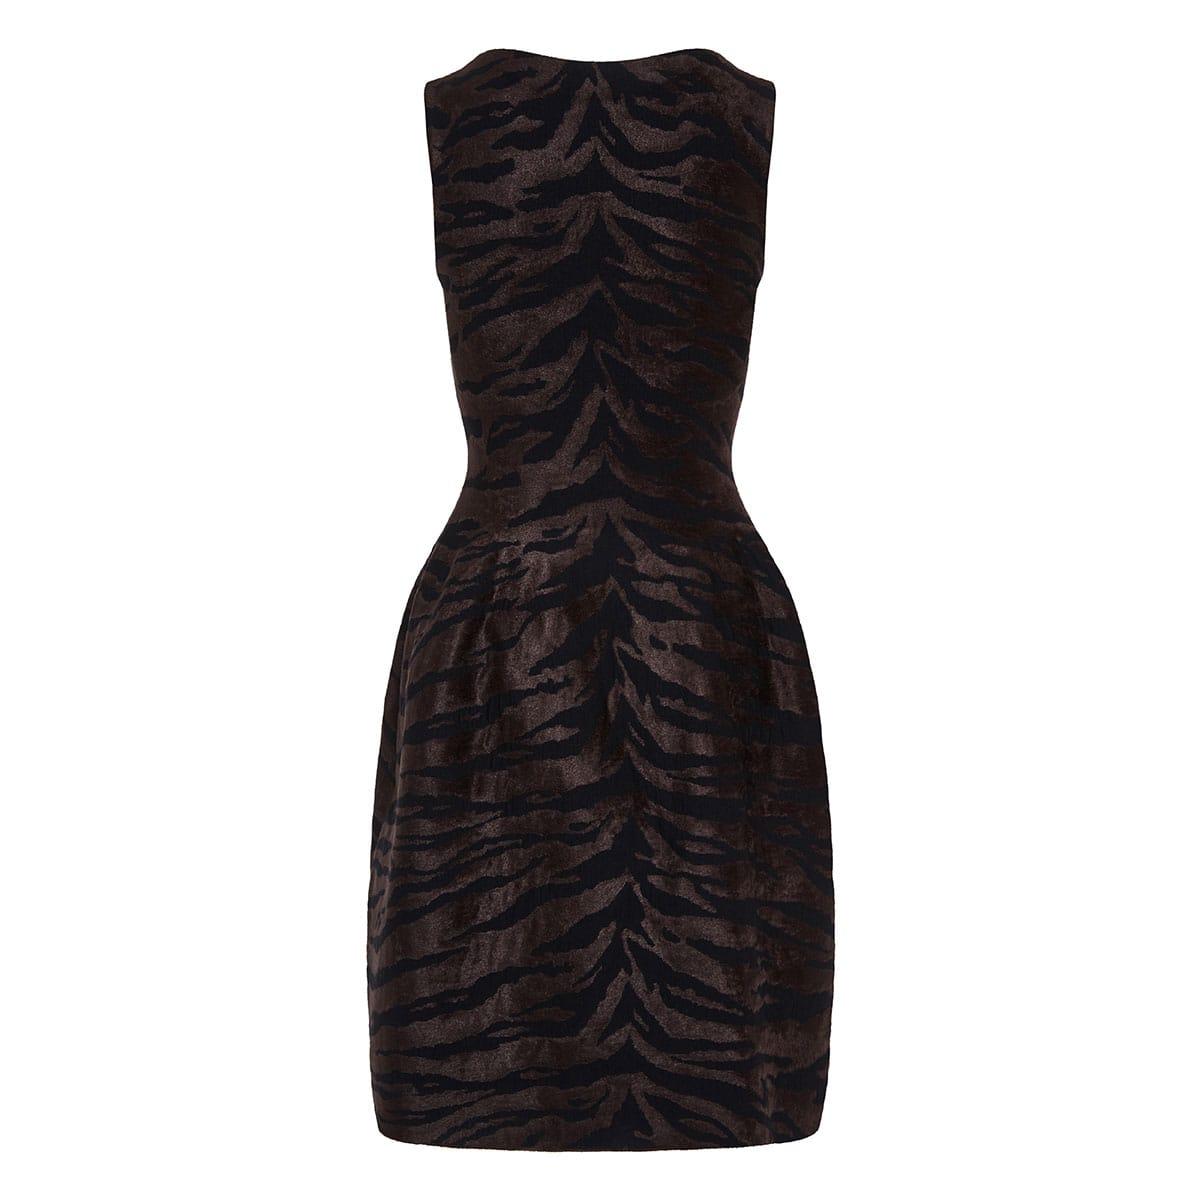 Zebra fit-and-flare jacquard dress